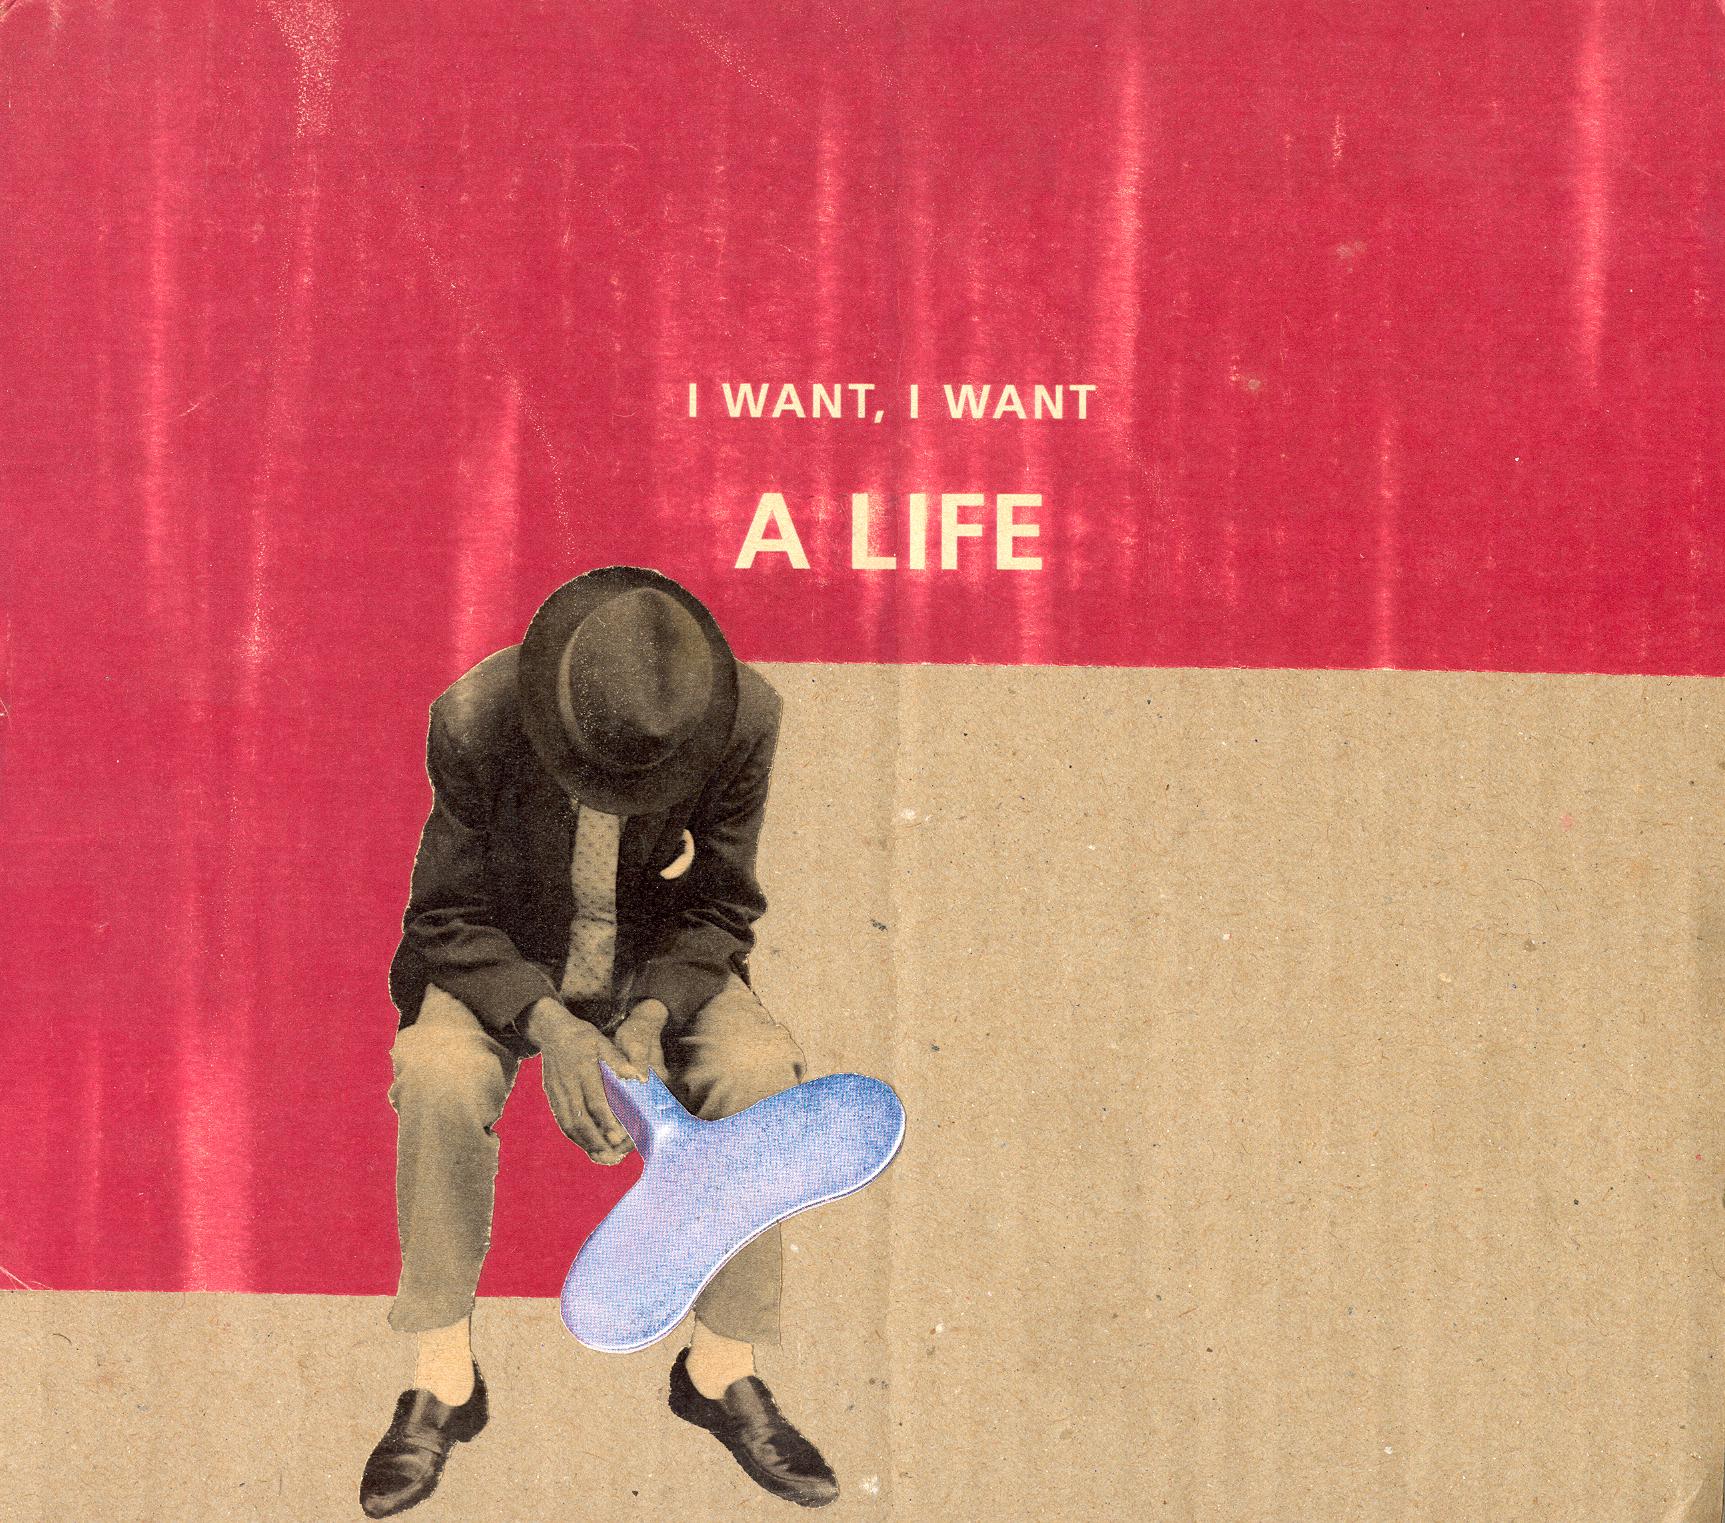 i-want-i-want-a-life-2000